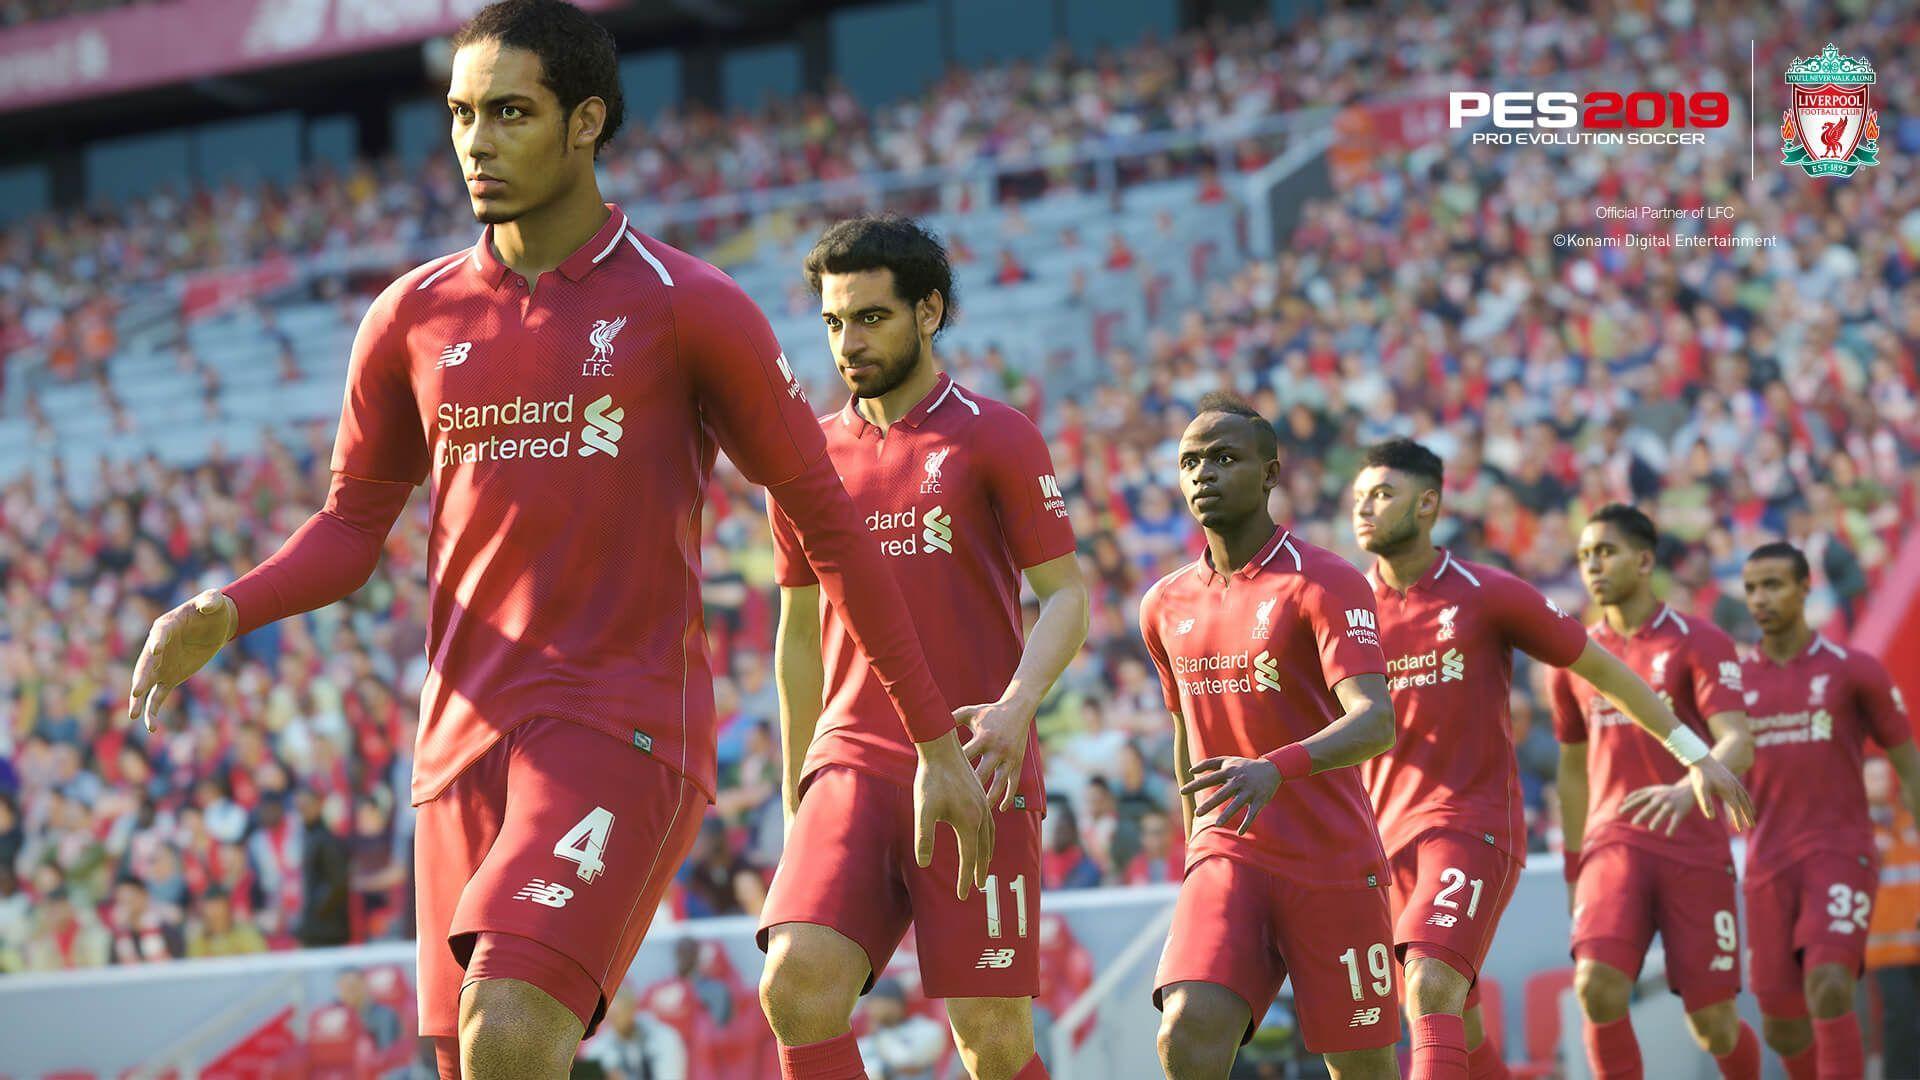 الصفحة غير متاحه Pro Evolution Soccer Evolution Soccer Ps Plus